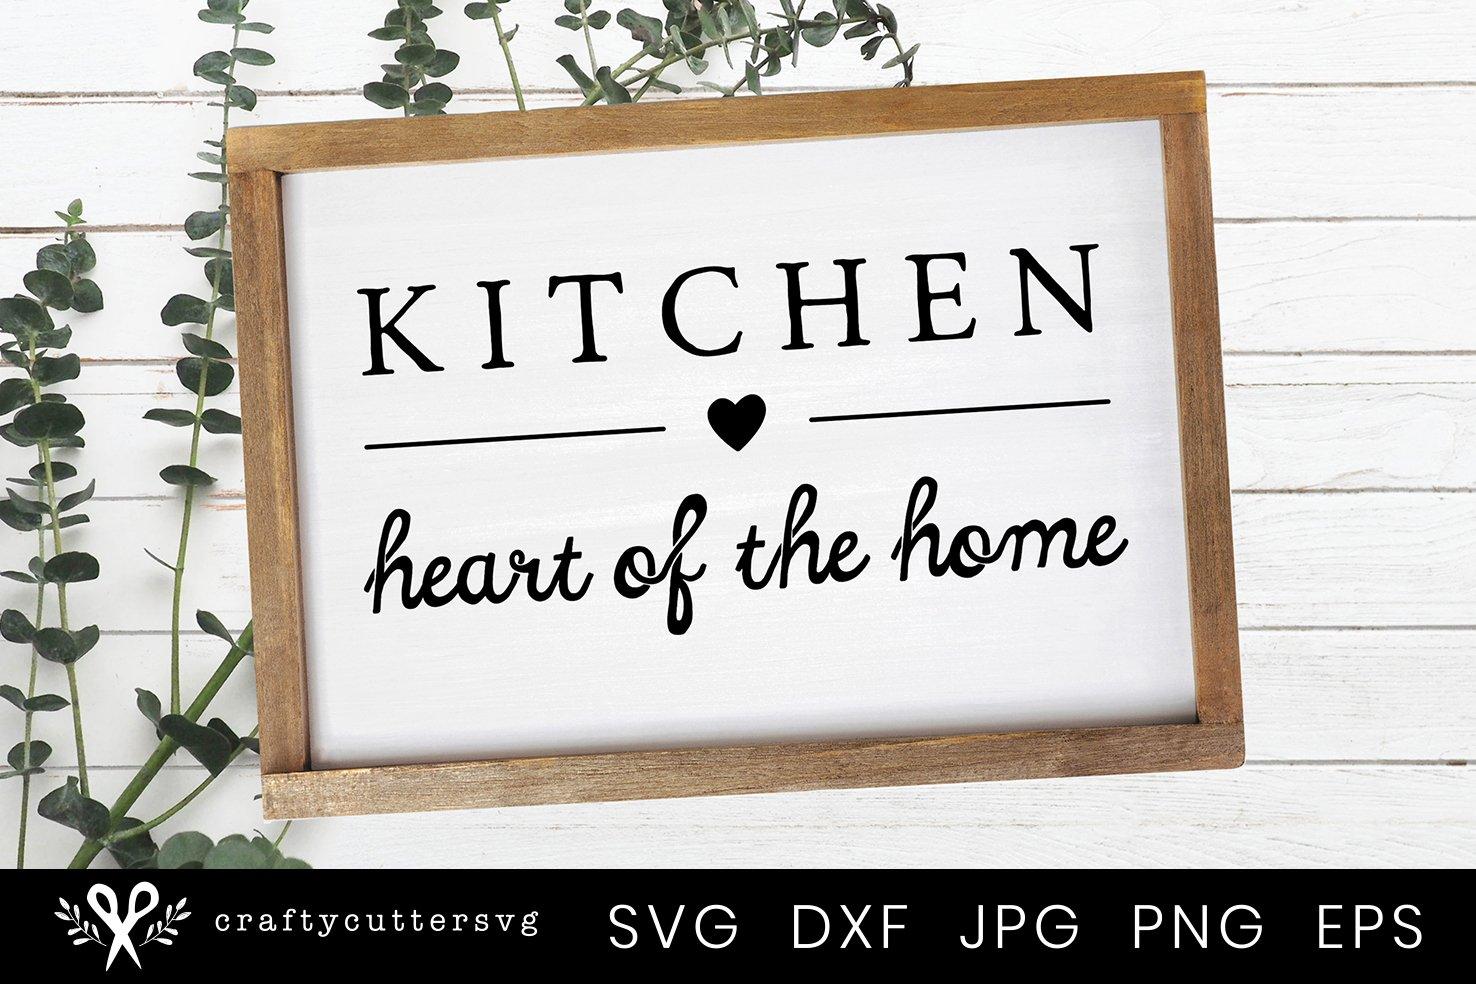 Farmhouse Kitchen Sign Svg Heart Of The Home 581061 Cut Files Design Bundles